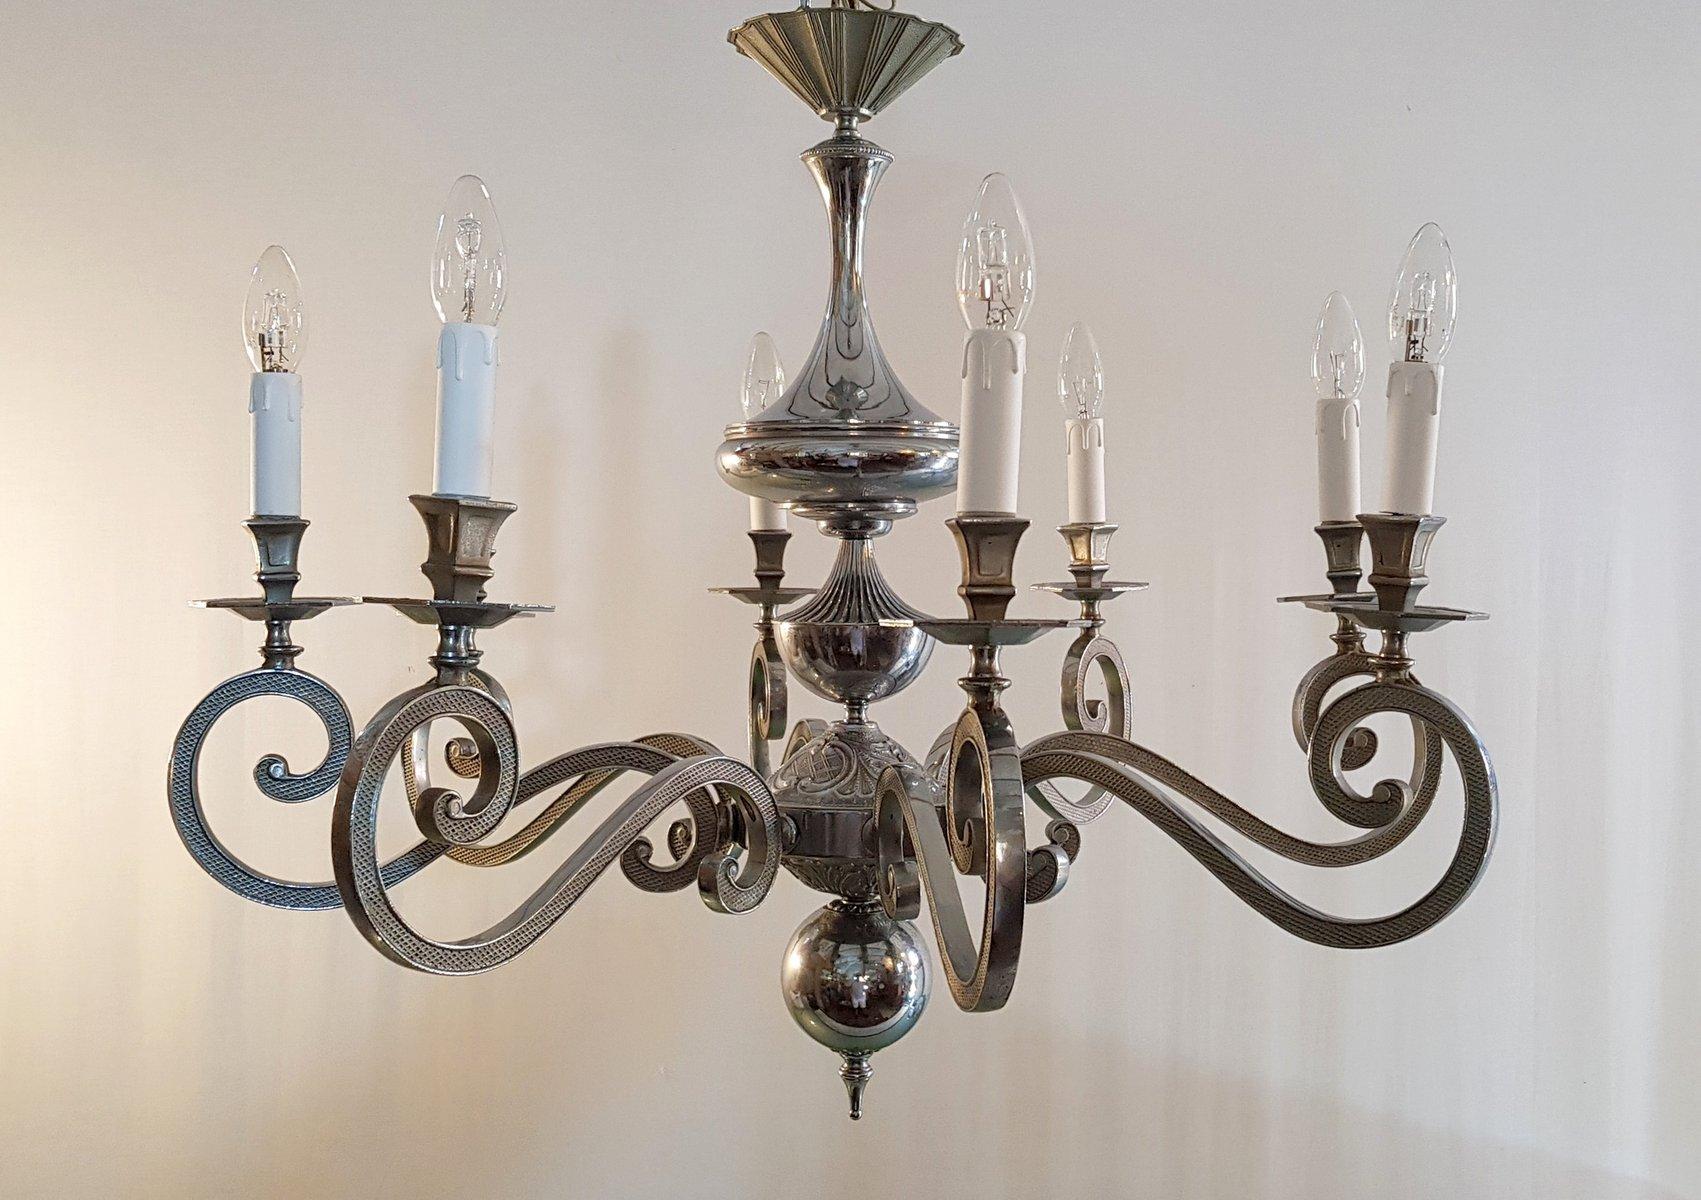 Lampadario barocco moderno lampadario nero lampada pendente